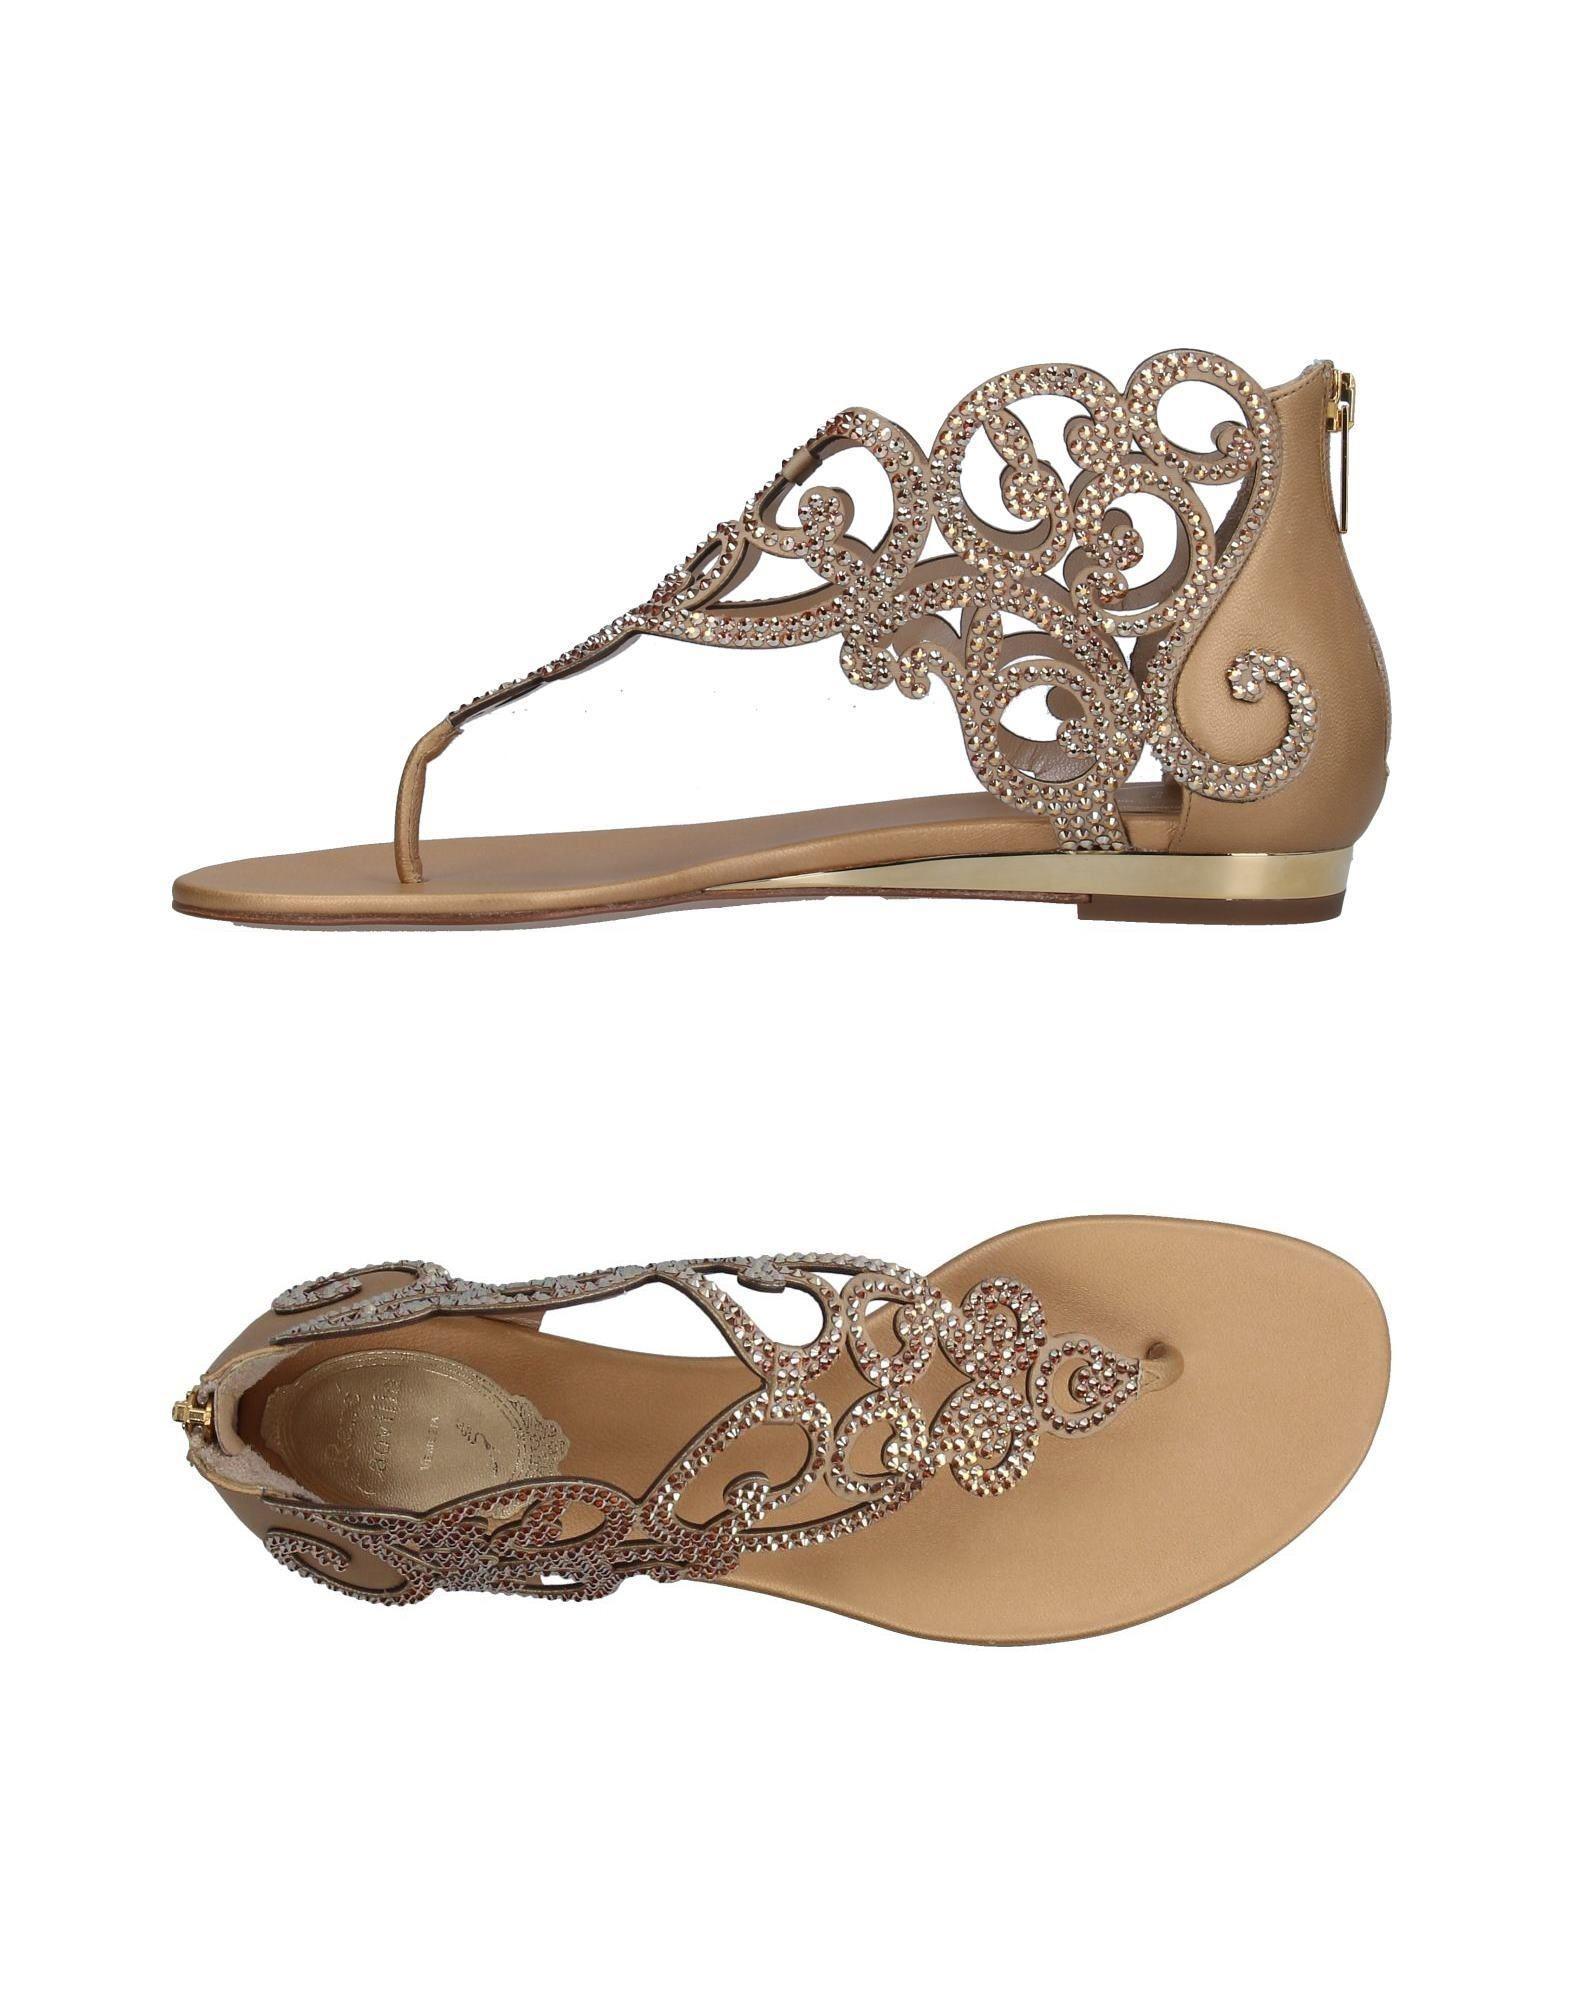 cf18f28d0a7 Lyst - Rene Caovilla Toe Strap Sandal in Natural